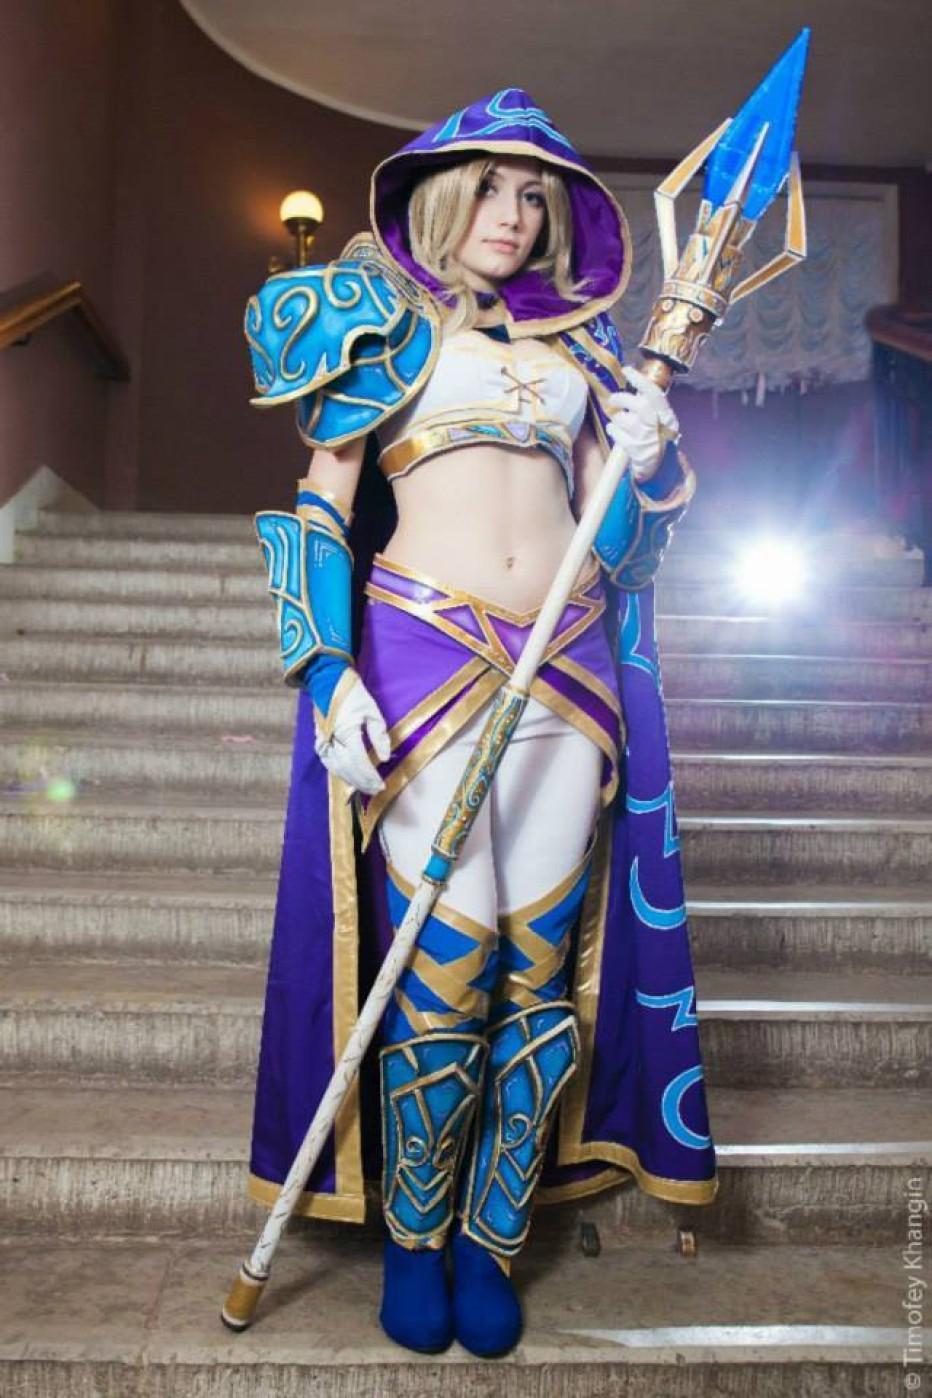 Warcraft-III-Jaina-Proudmoore-Narga-Cosplay-Gamers-Heroes-13.jpg